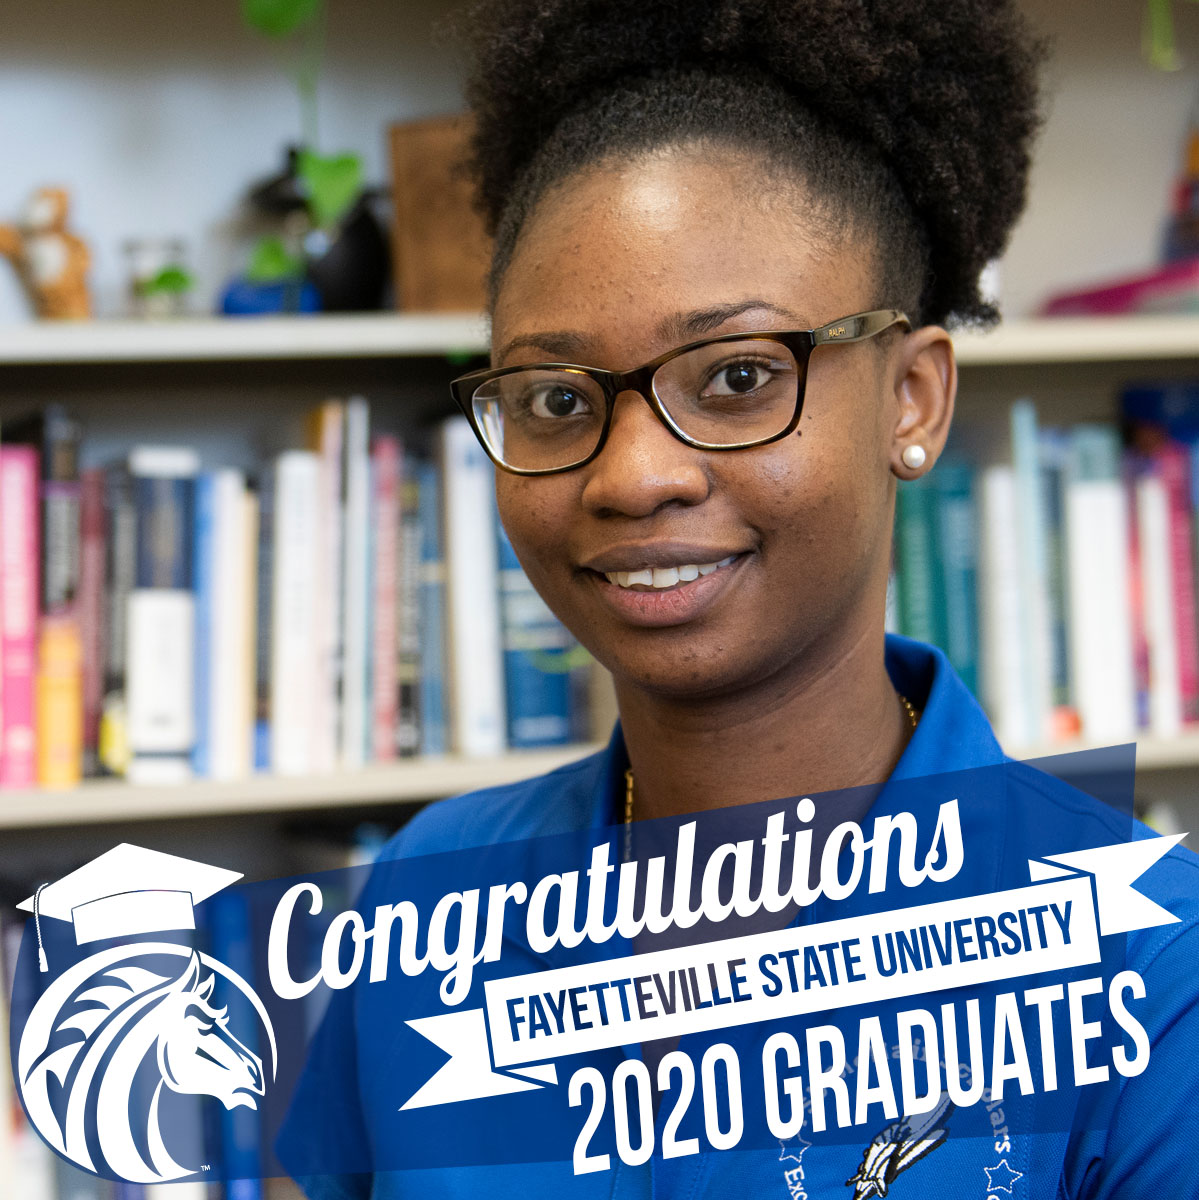 Congratulations 2020 Graduates facebook photo frame